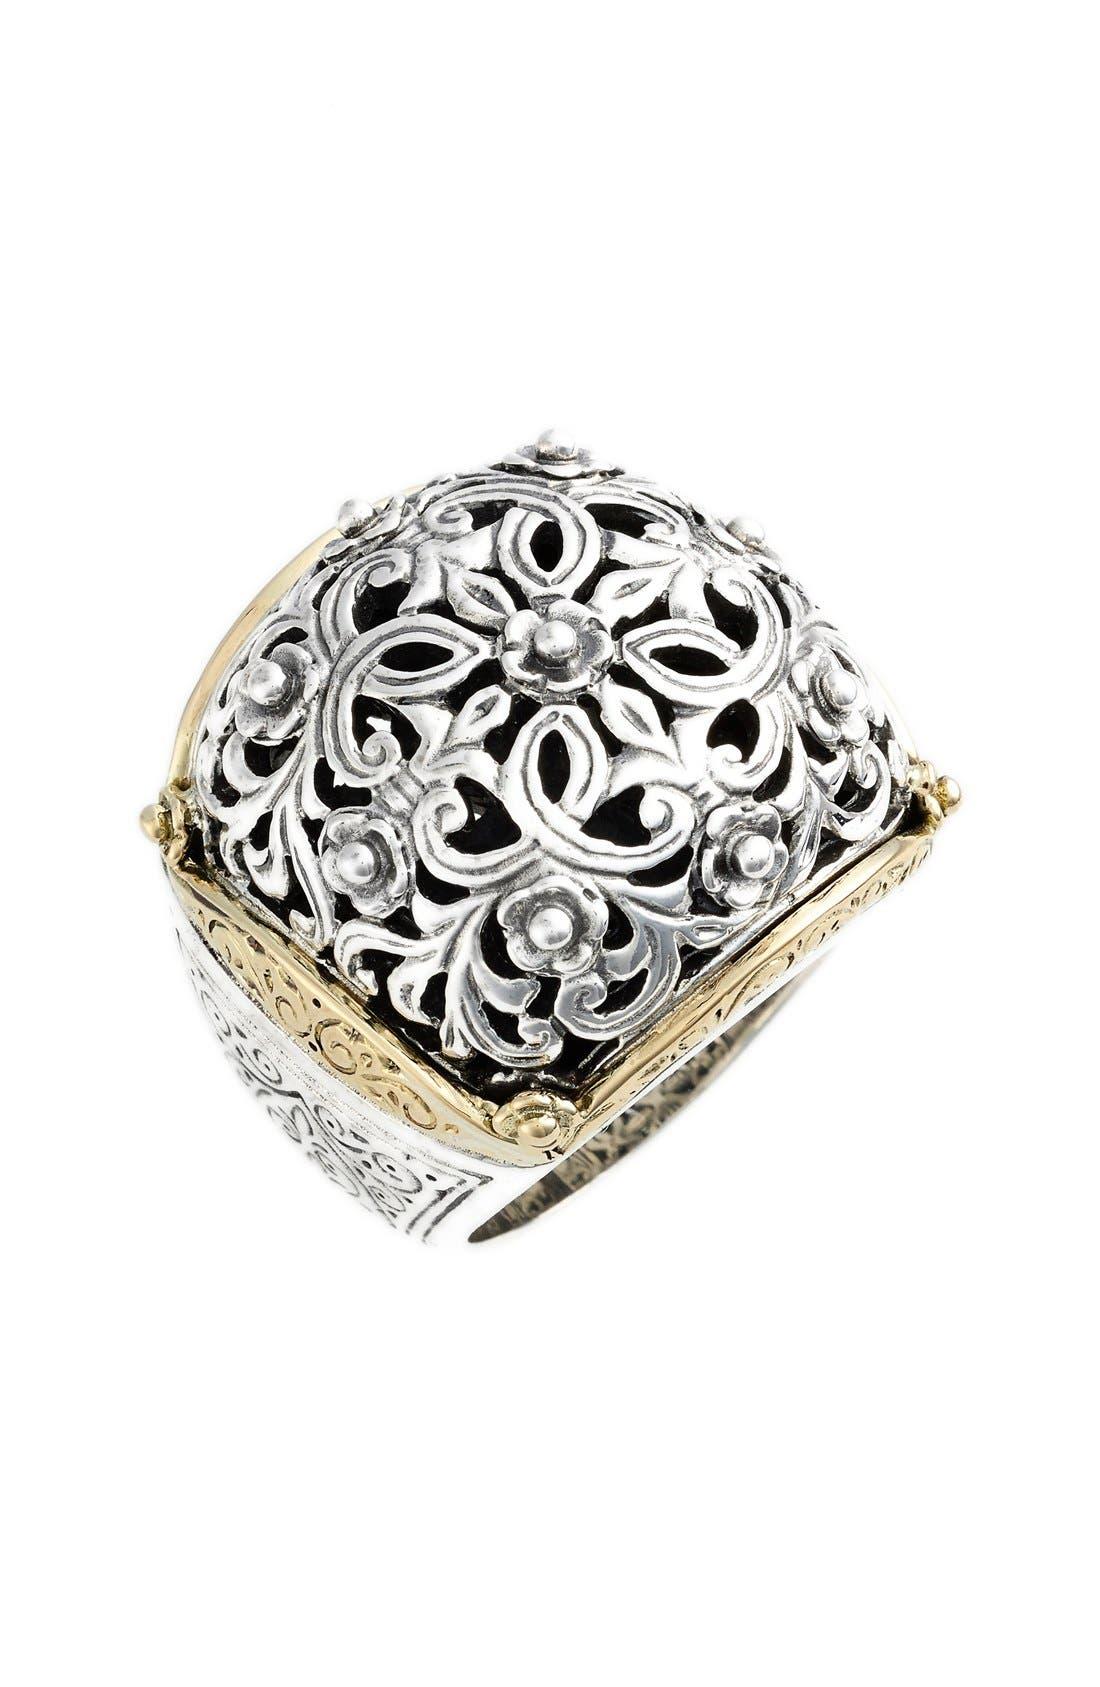 Main Image - Konstantino 'Silver & Gold Classics' Filigree Ring